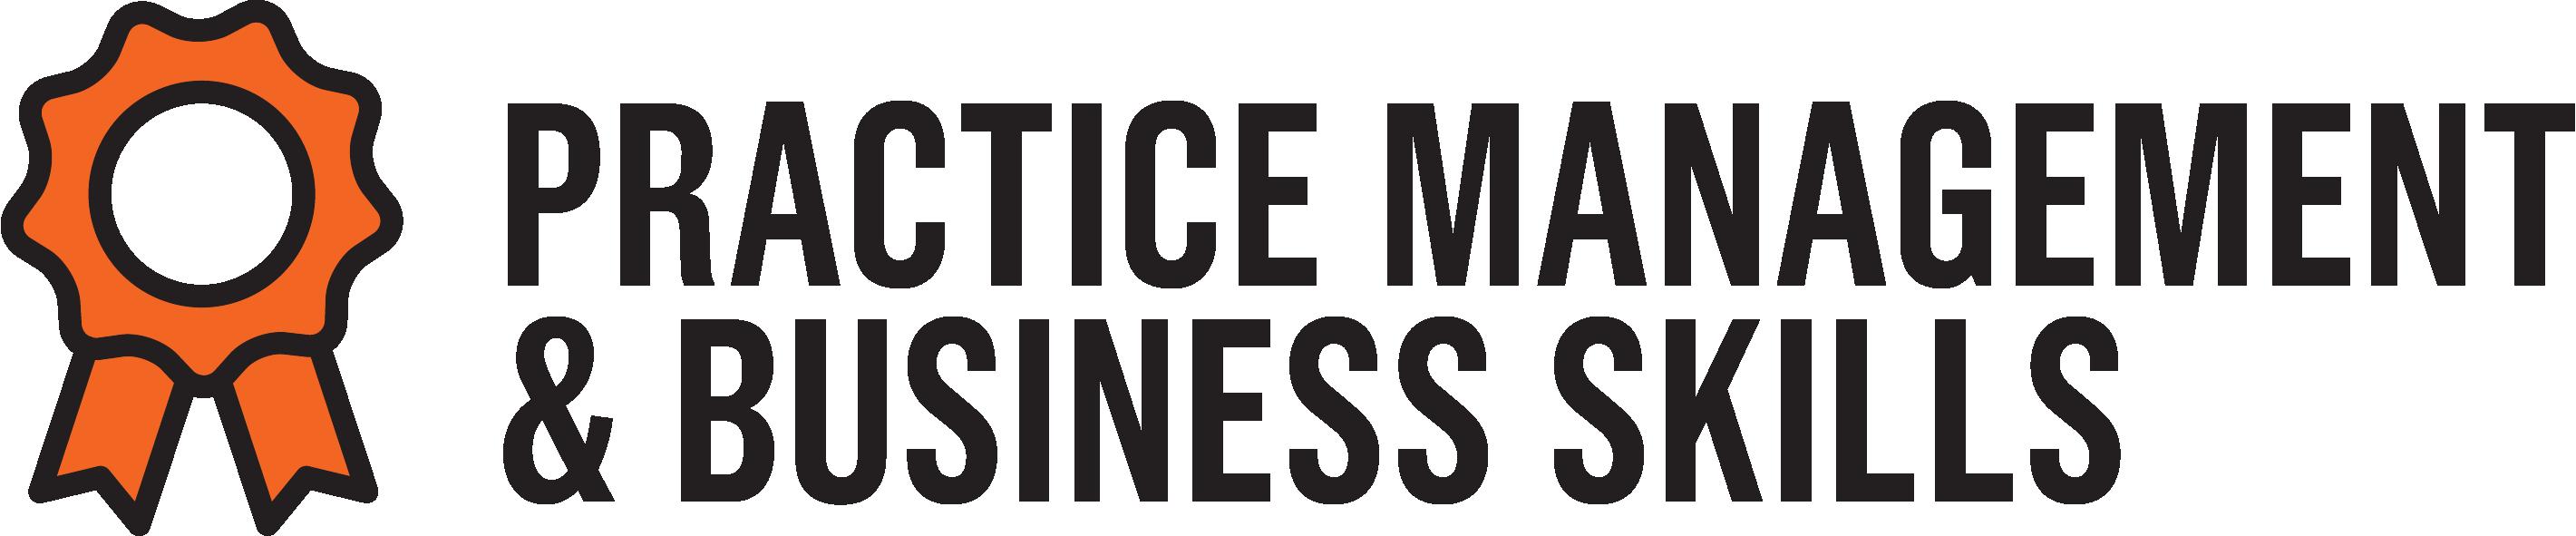 practice management & business skills